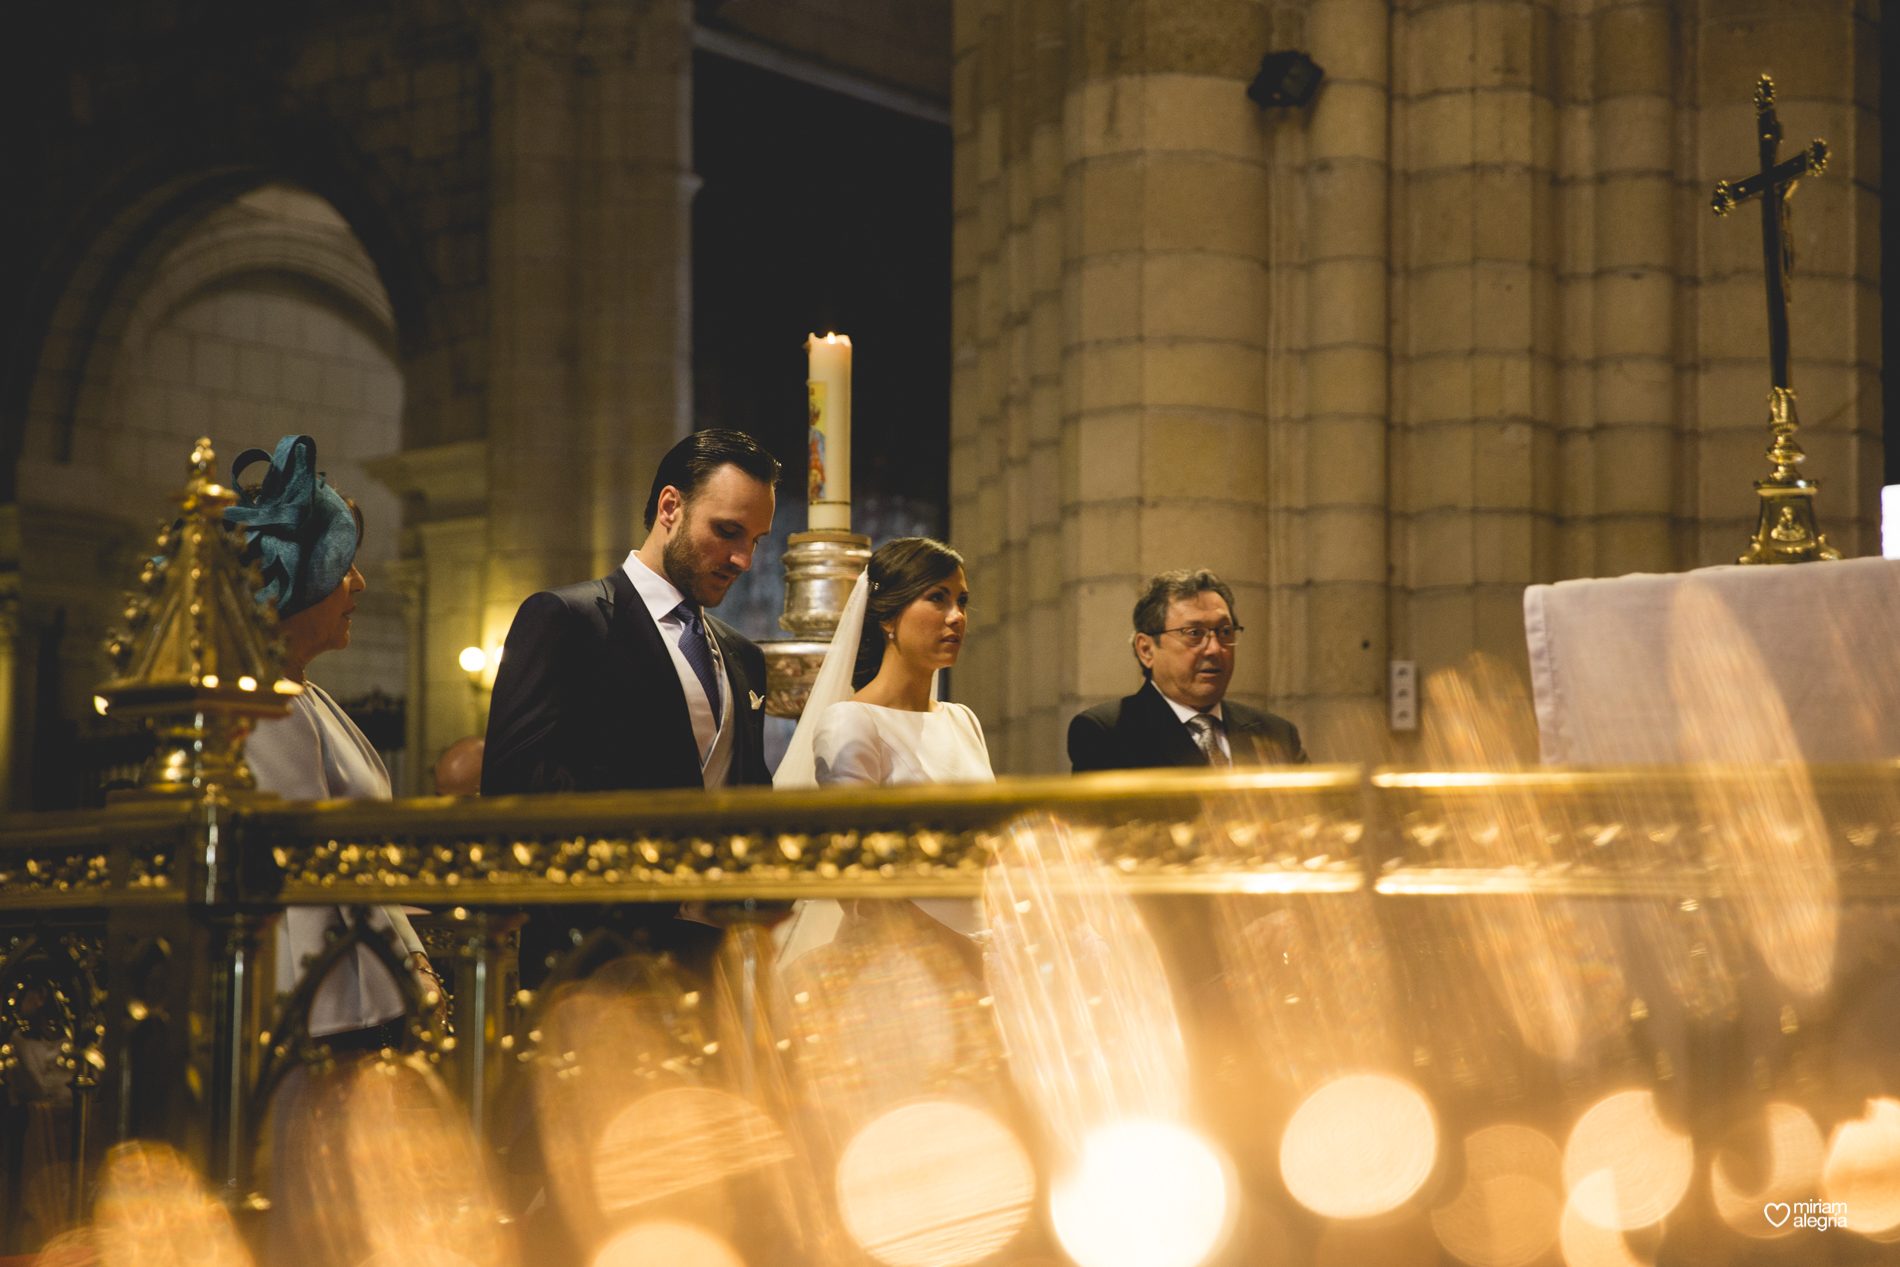 boda-en-la-catedral-de-murcia-miriam-alegria-fotografos-boda-murcia-51